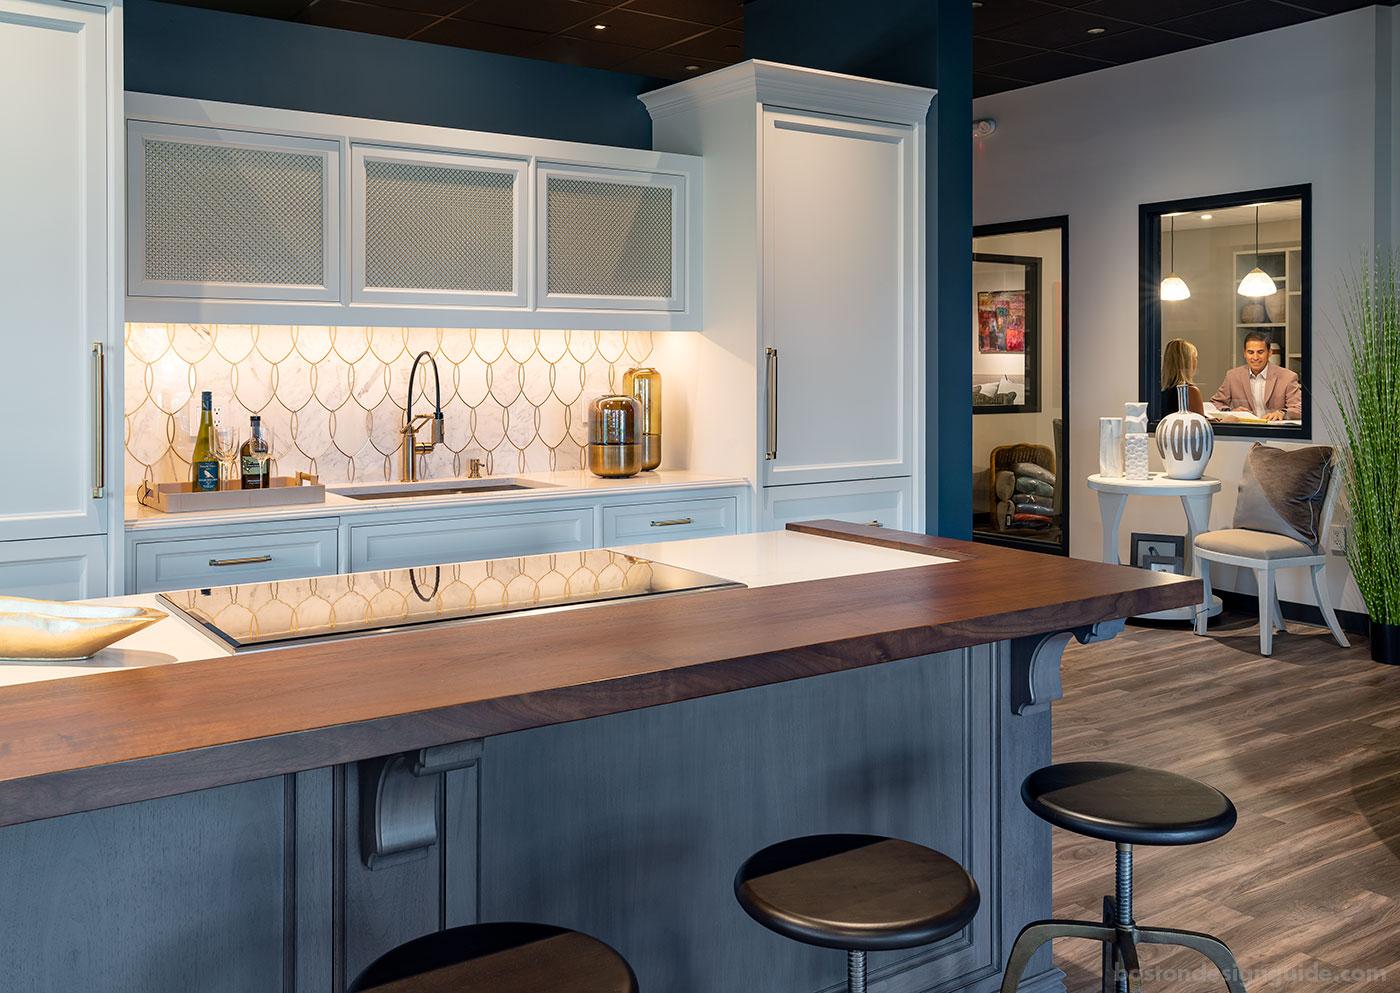 Interiology Design Studio Co. showroom and custom kitchen